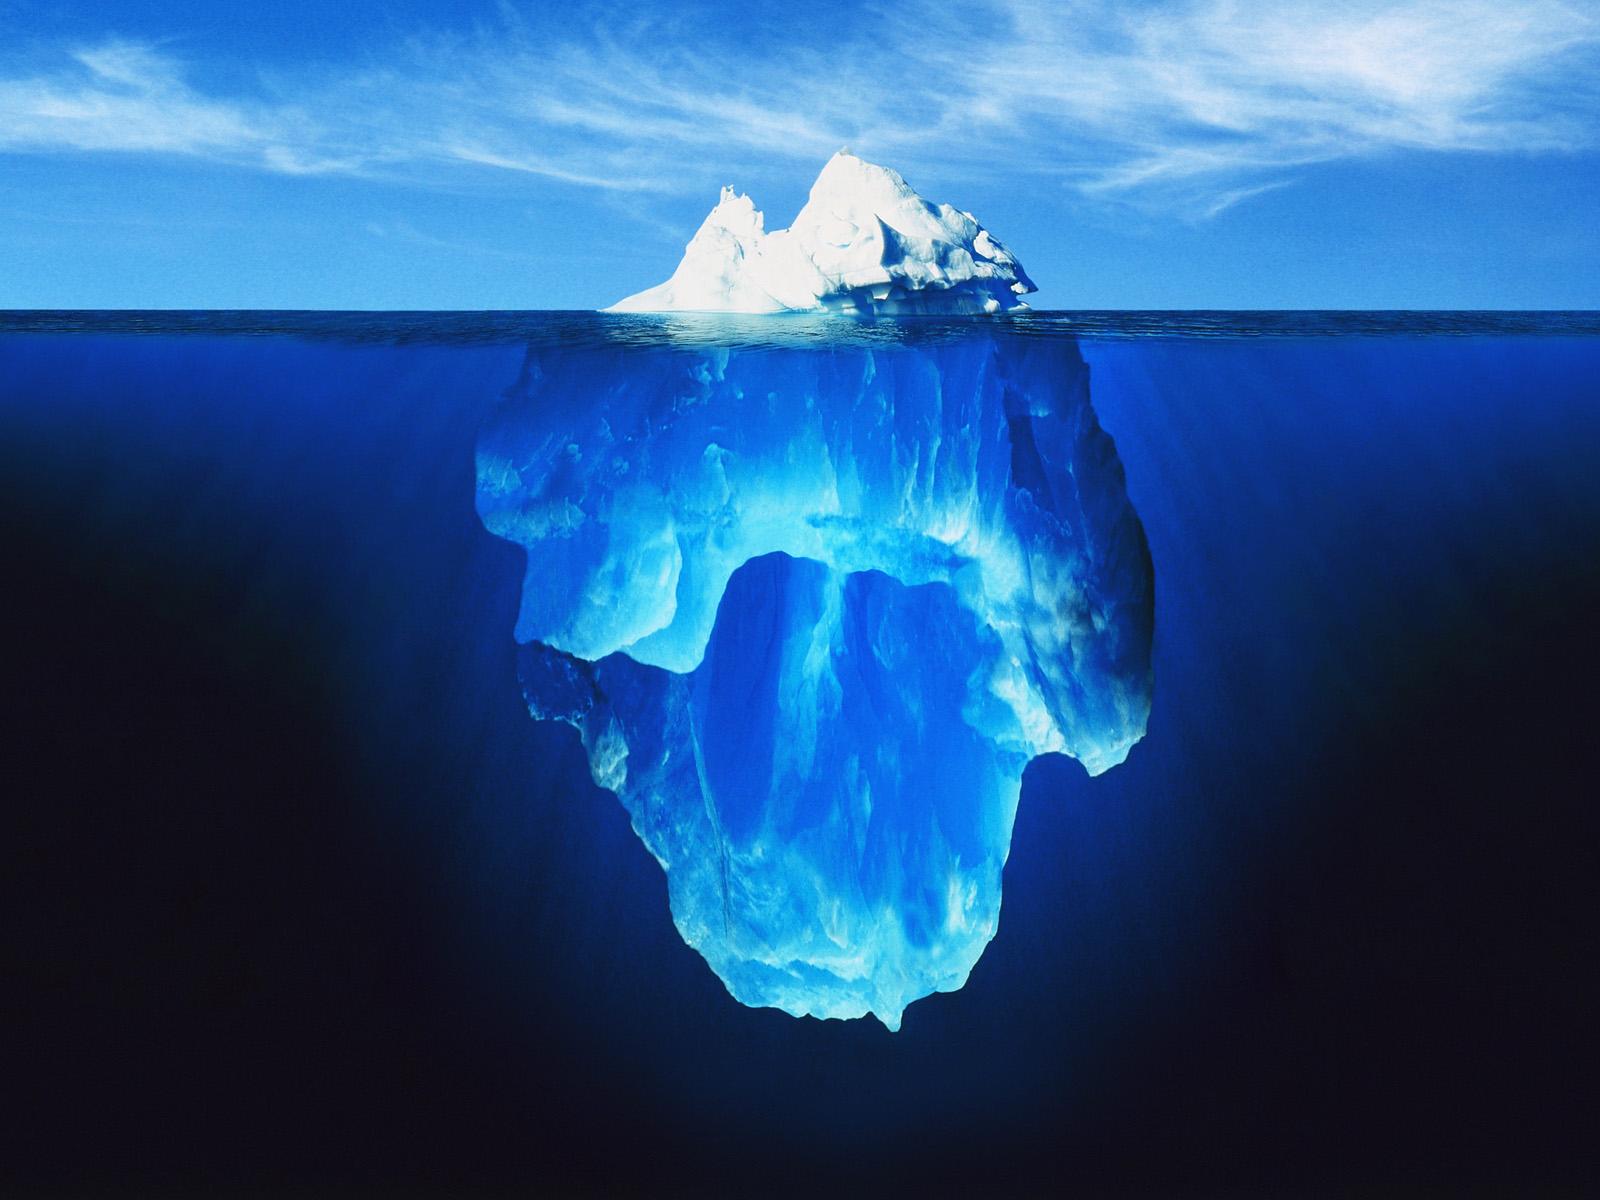 قمة جبل جليدي